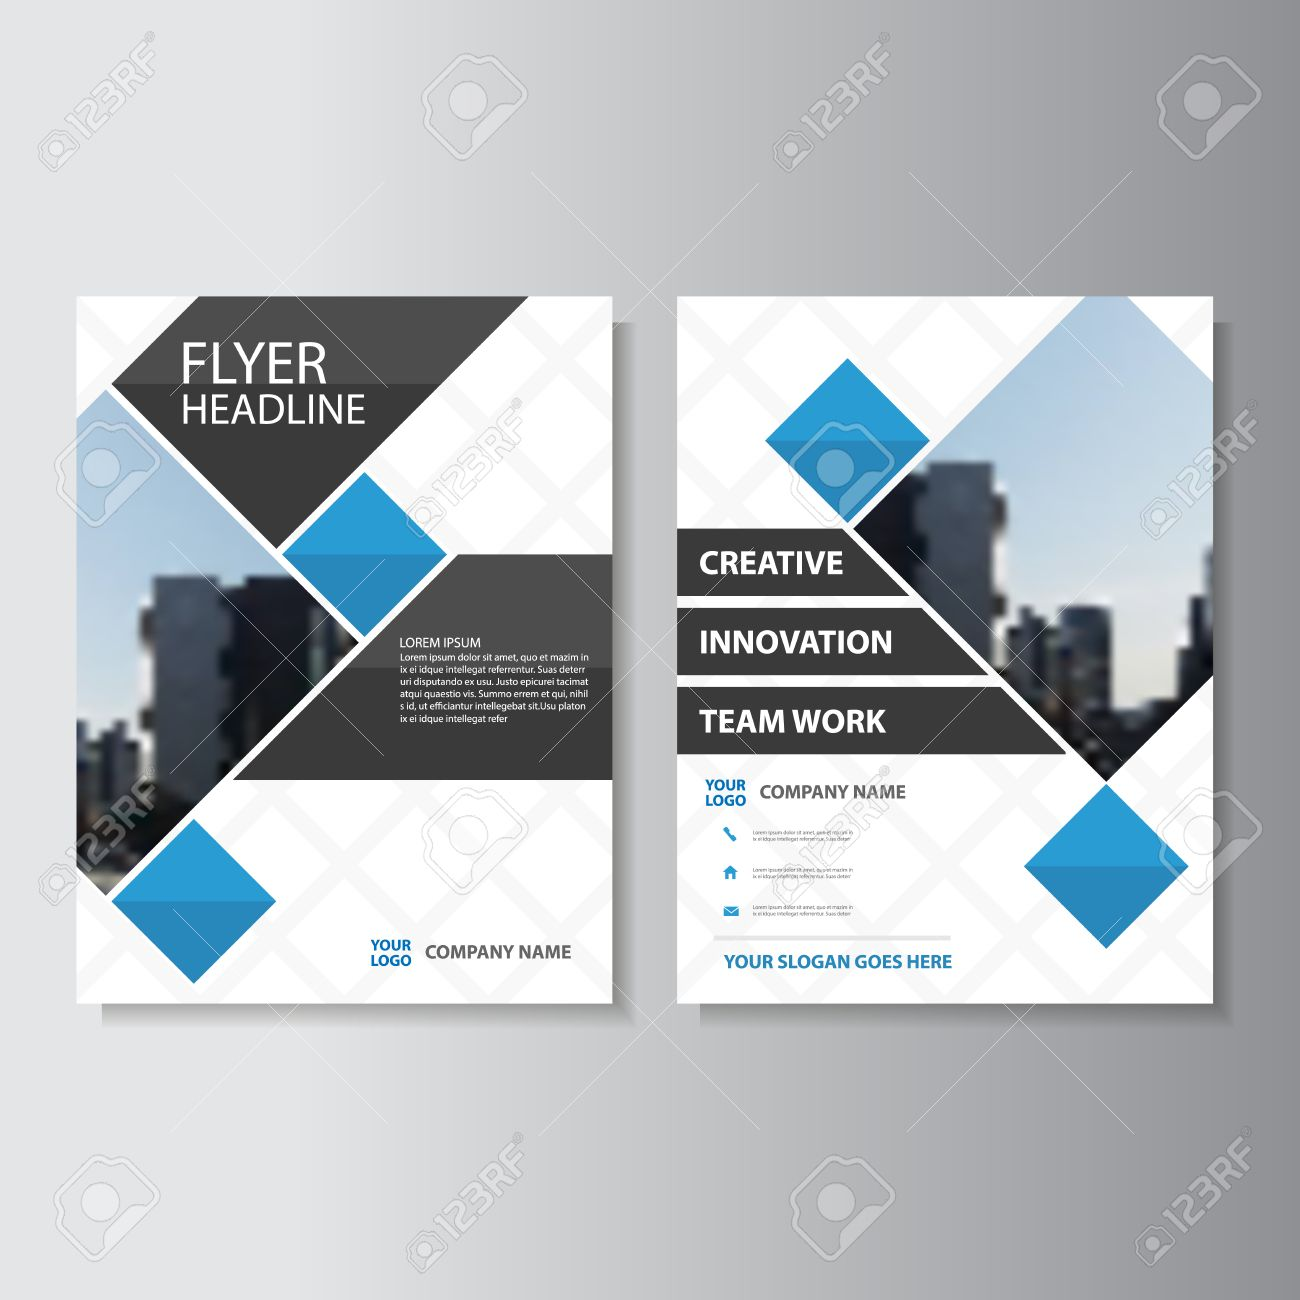 Vector Azul Creativa Propuesta De Negocio Informe Anual Folleto ...